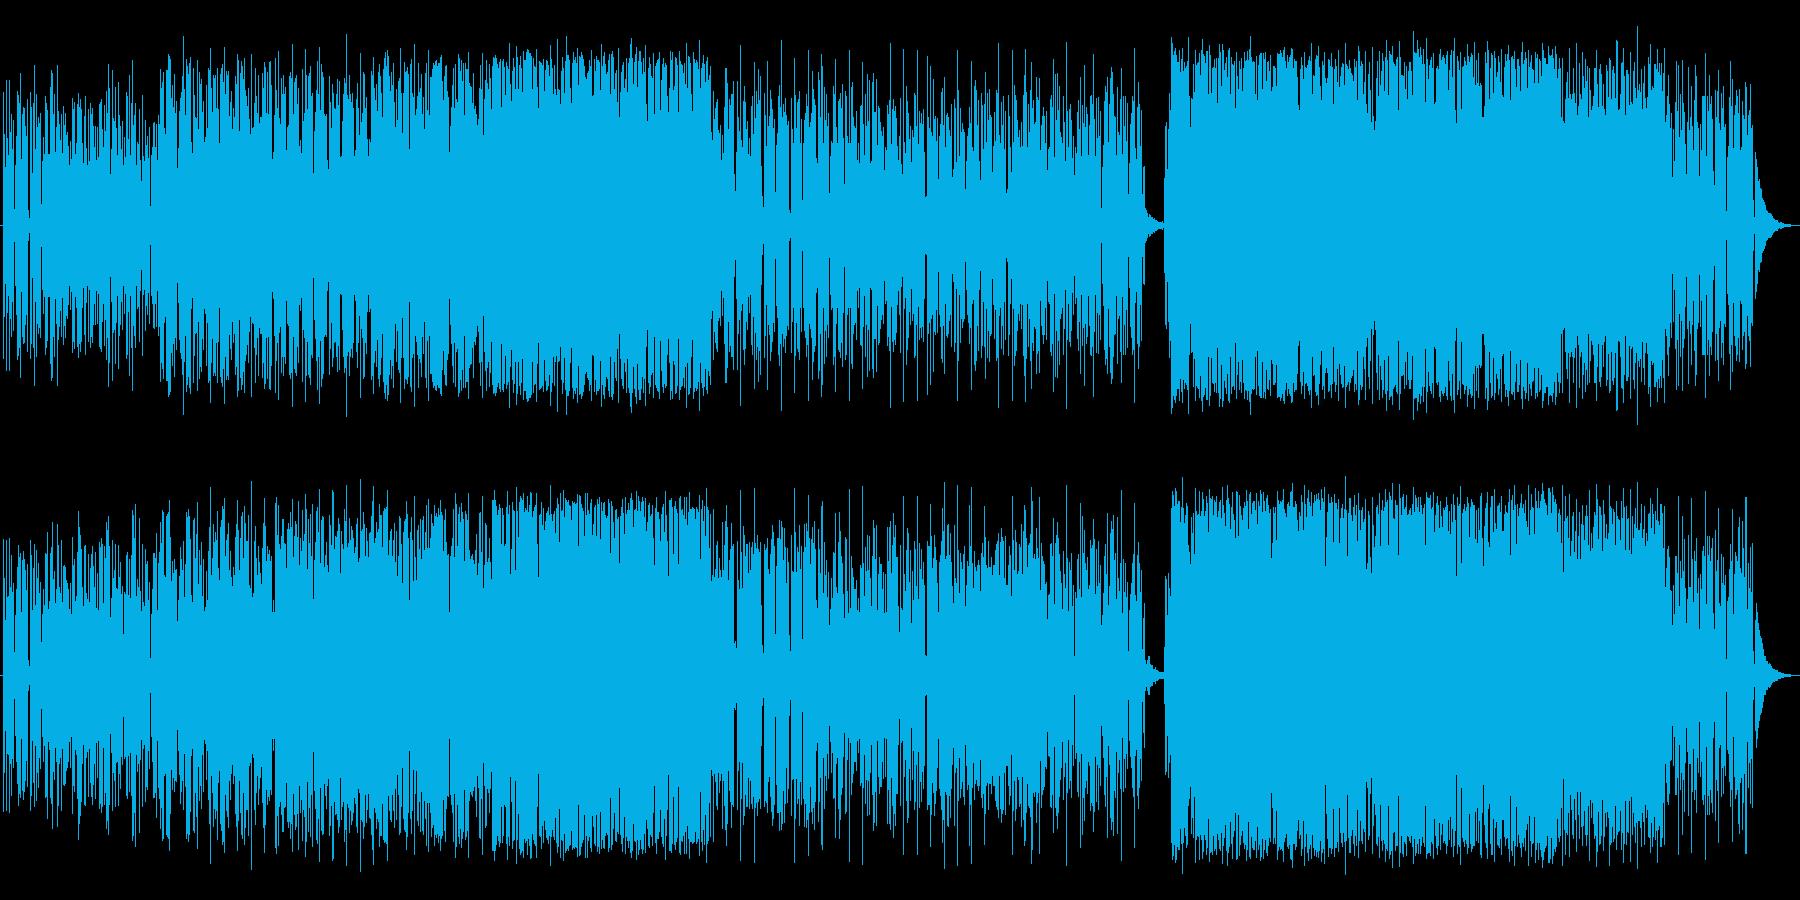 [TOKYO]東京に様々な想いを馳せる曲の再生済みの波形